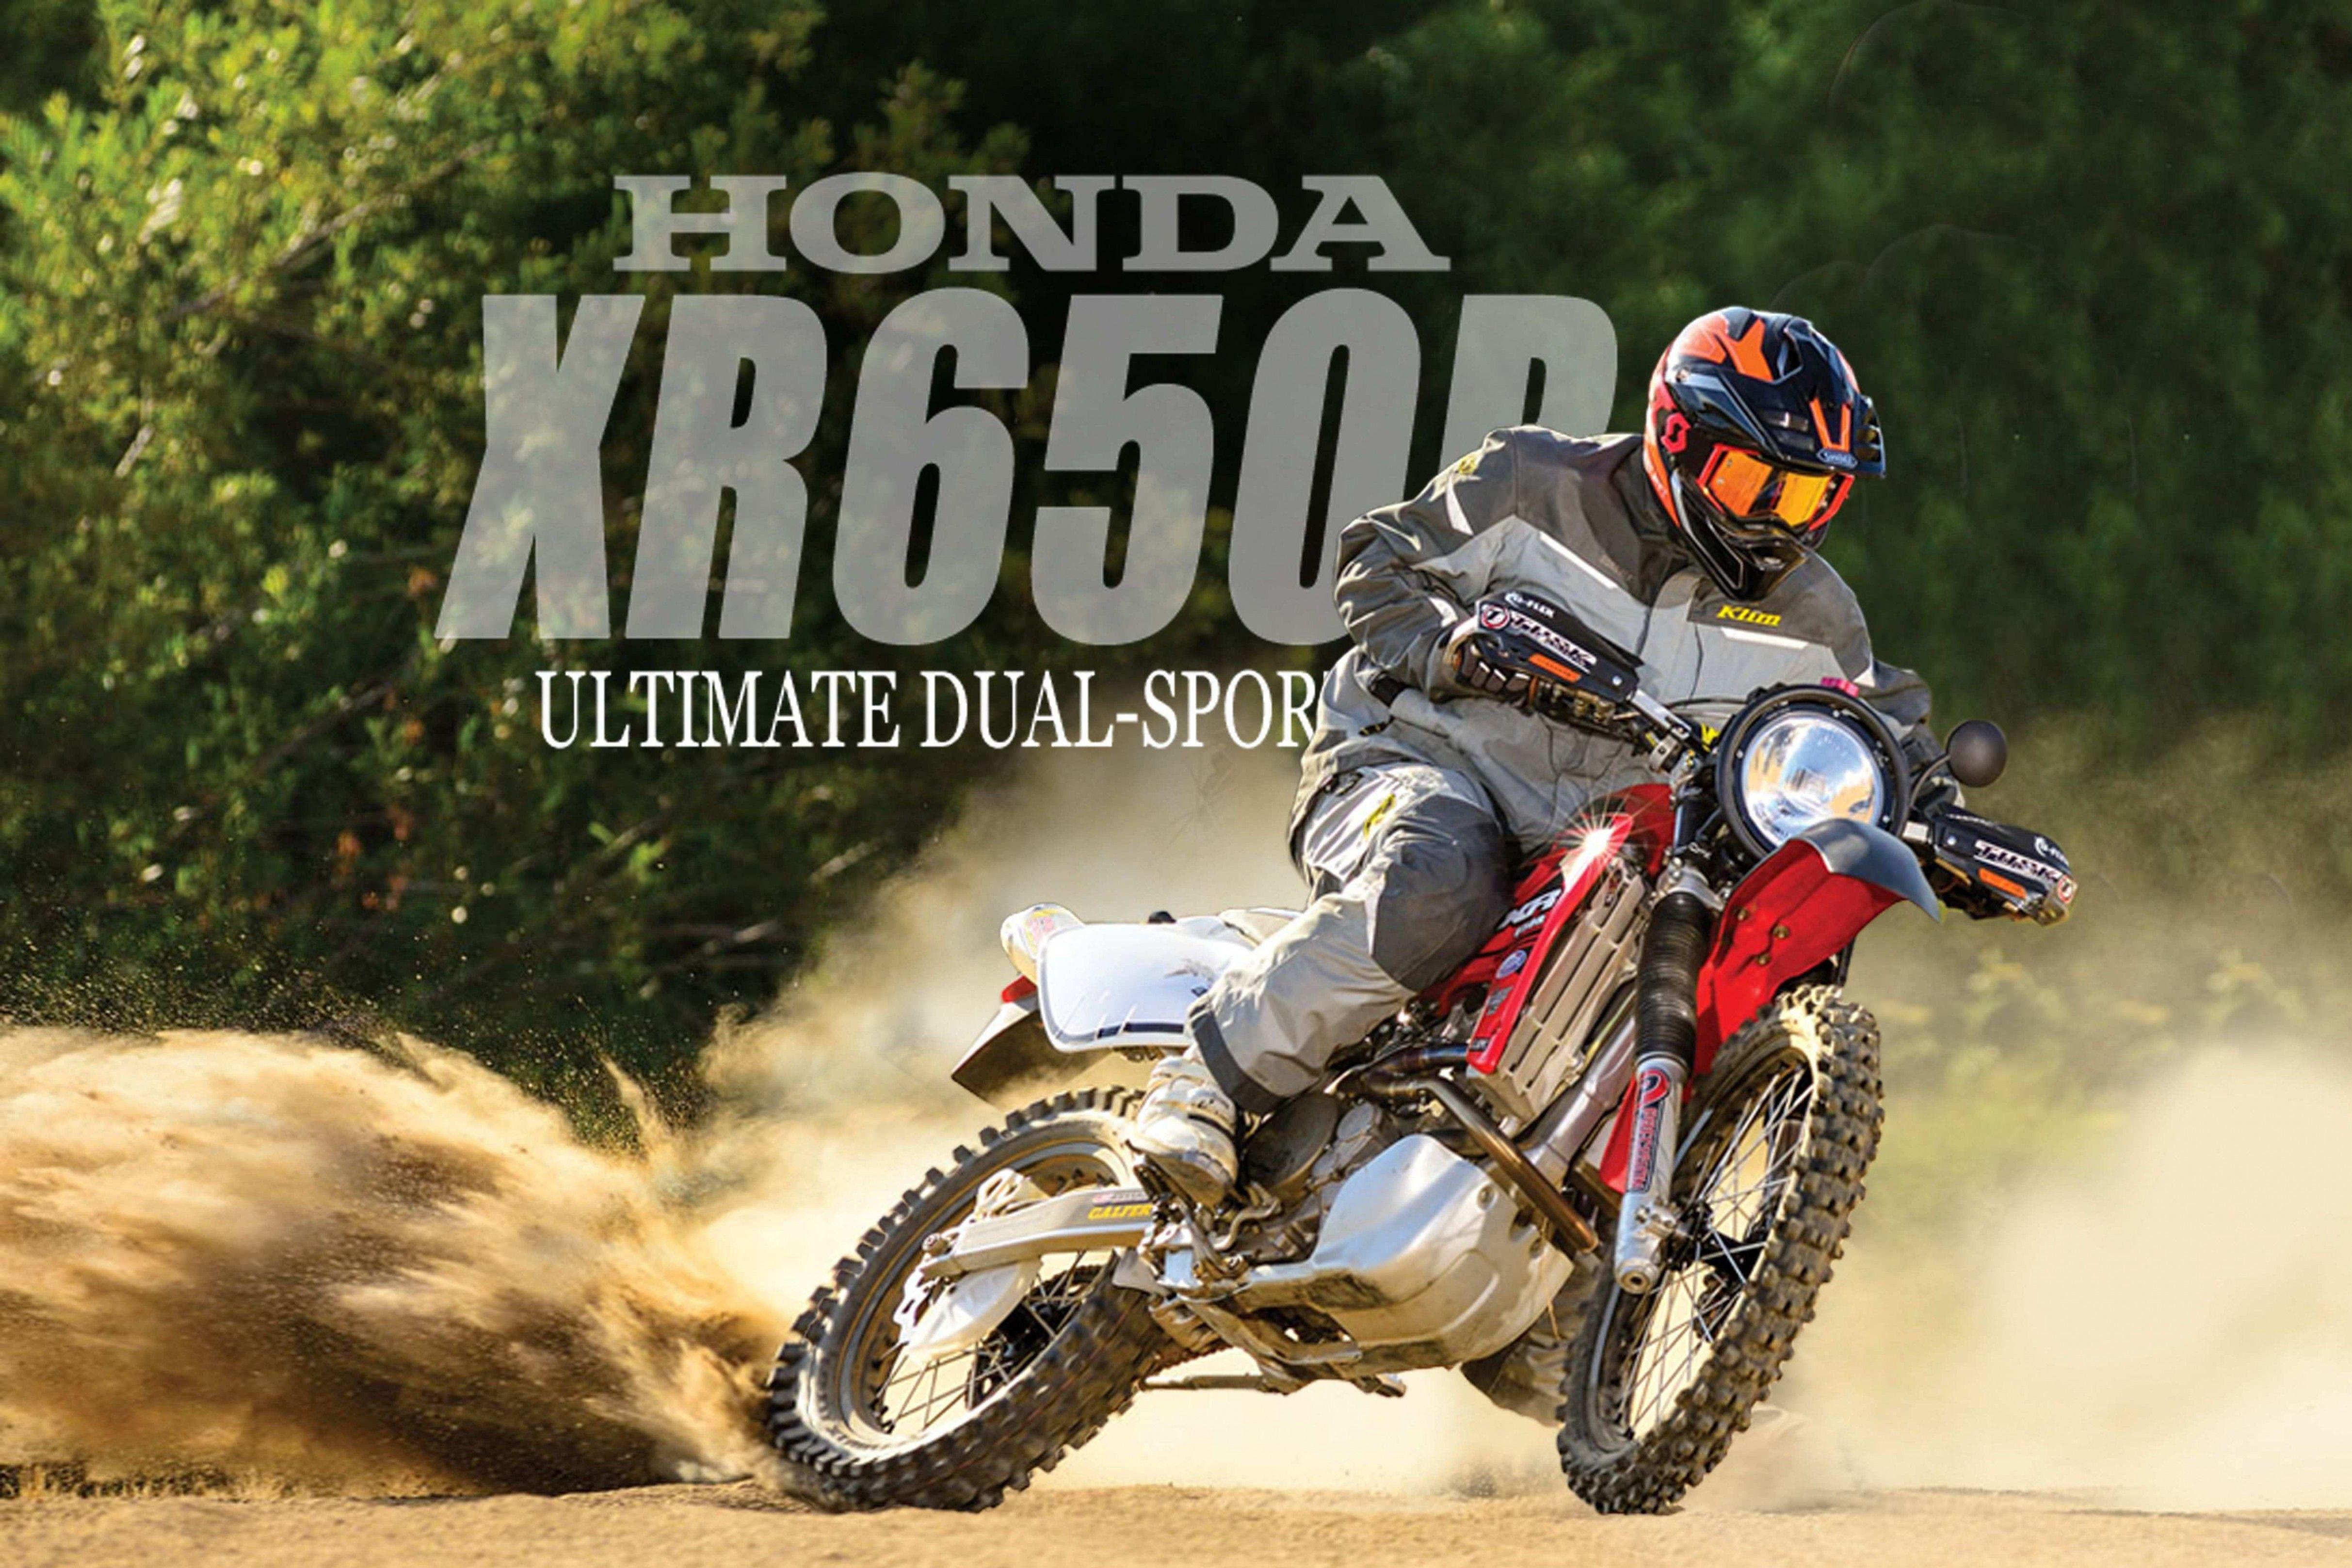 2020 Honda Xr650l Specs Price And Honda, New motorcycles